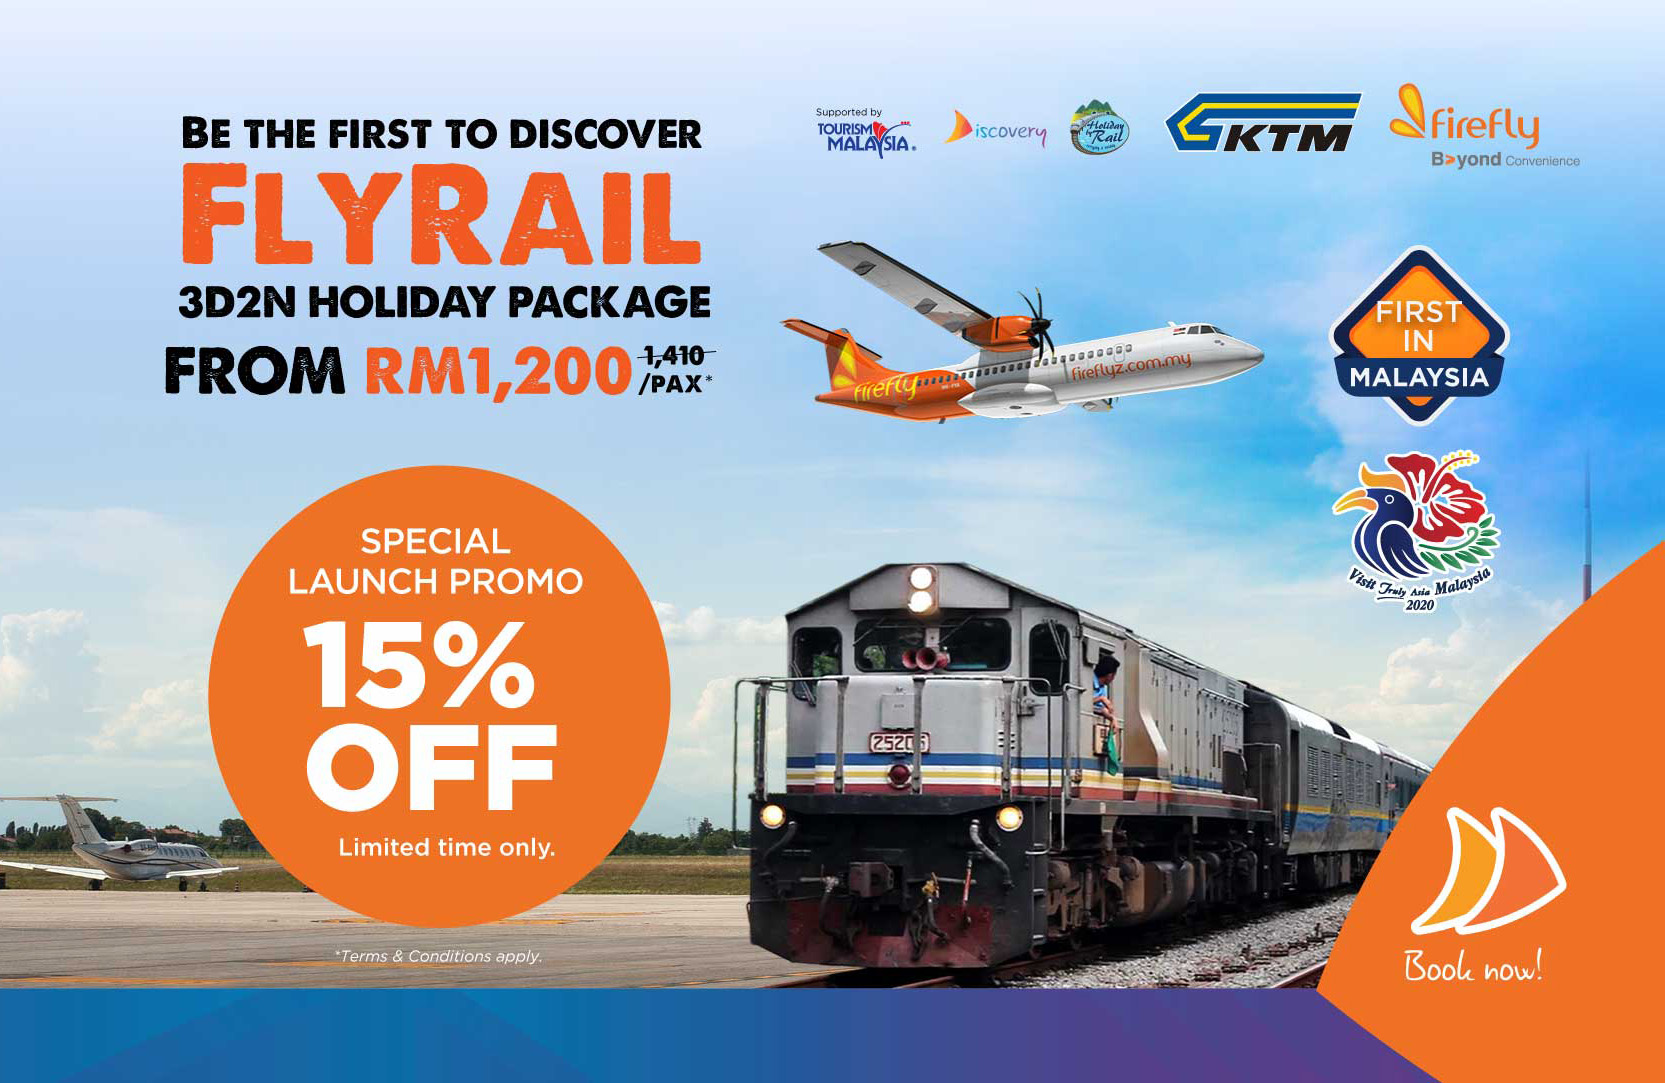 PHL – Experience new Firefly / KTMB travel promotion